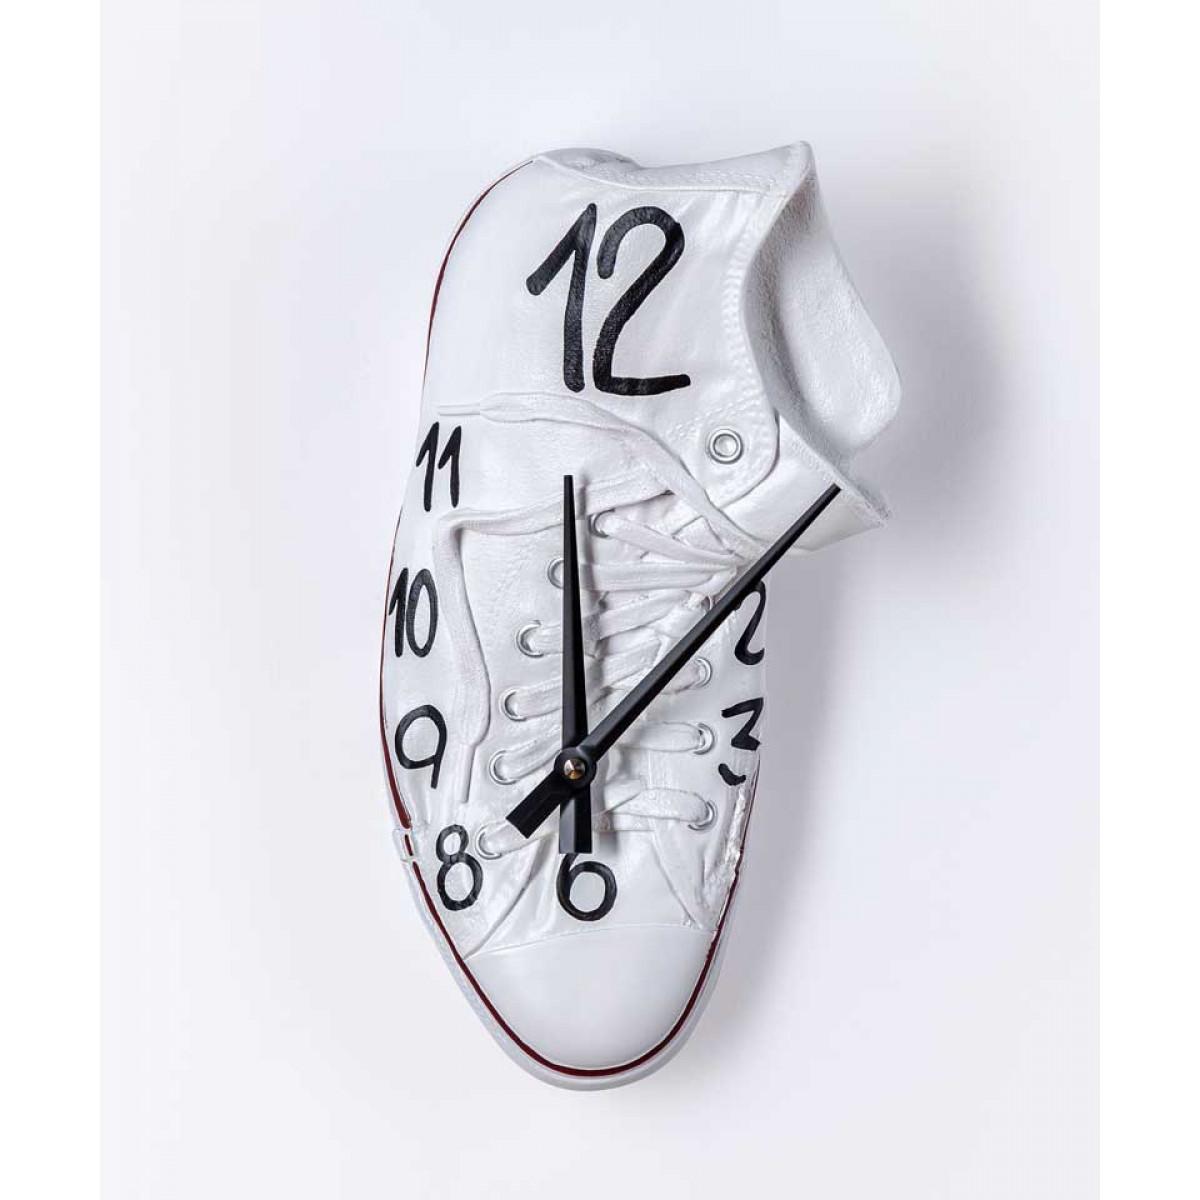 ceasur de perete moderne